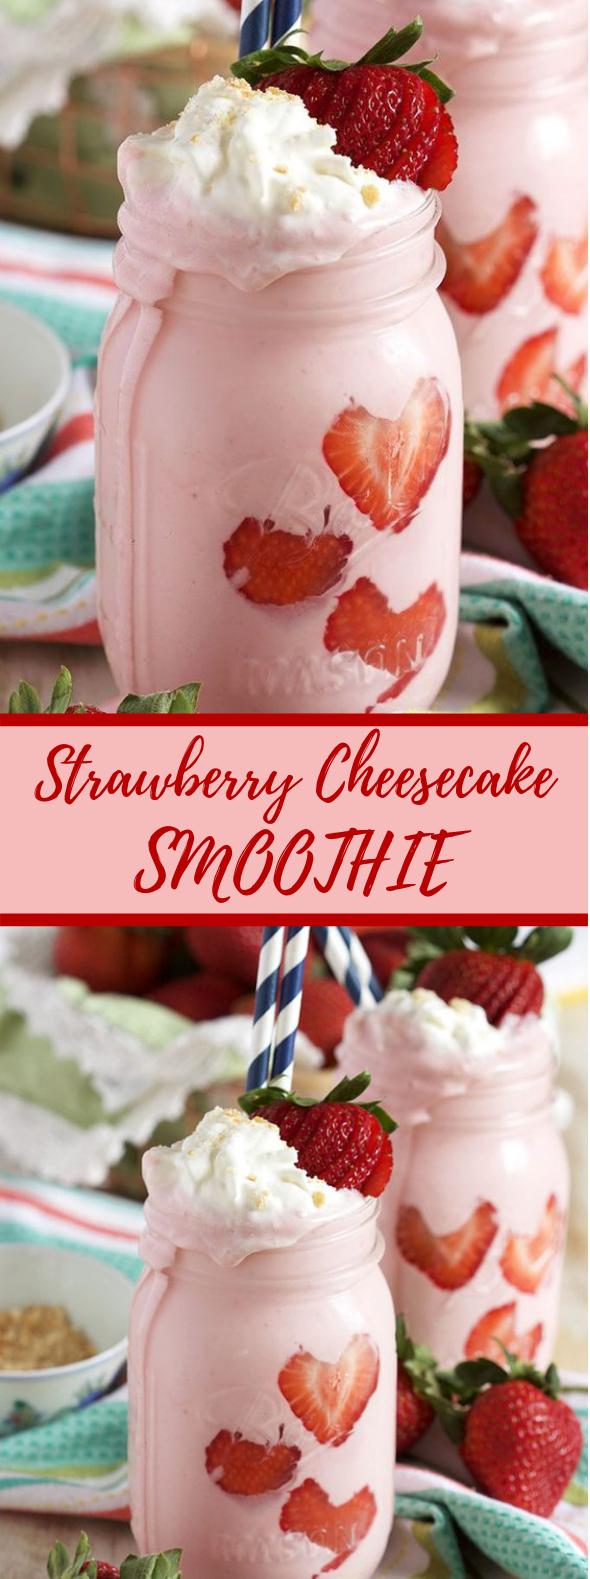 STRAWBERRY CHEESECAKE SMOOTHIE #sweet #smoothies